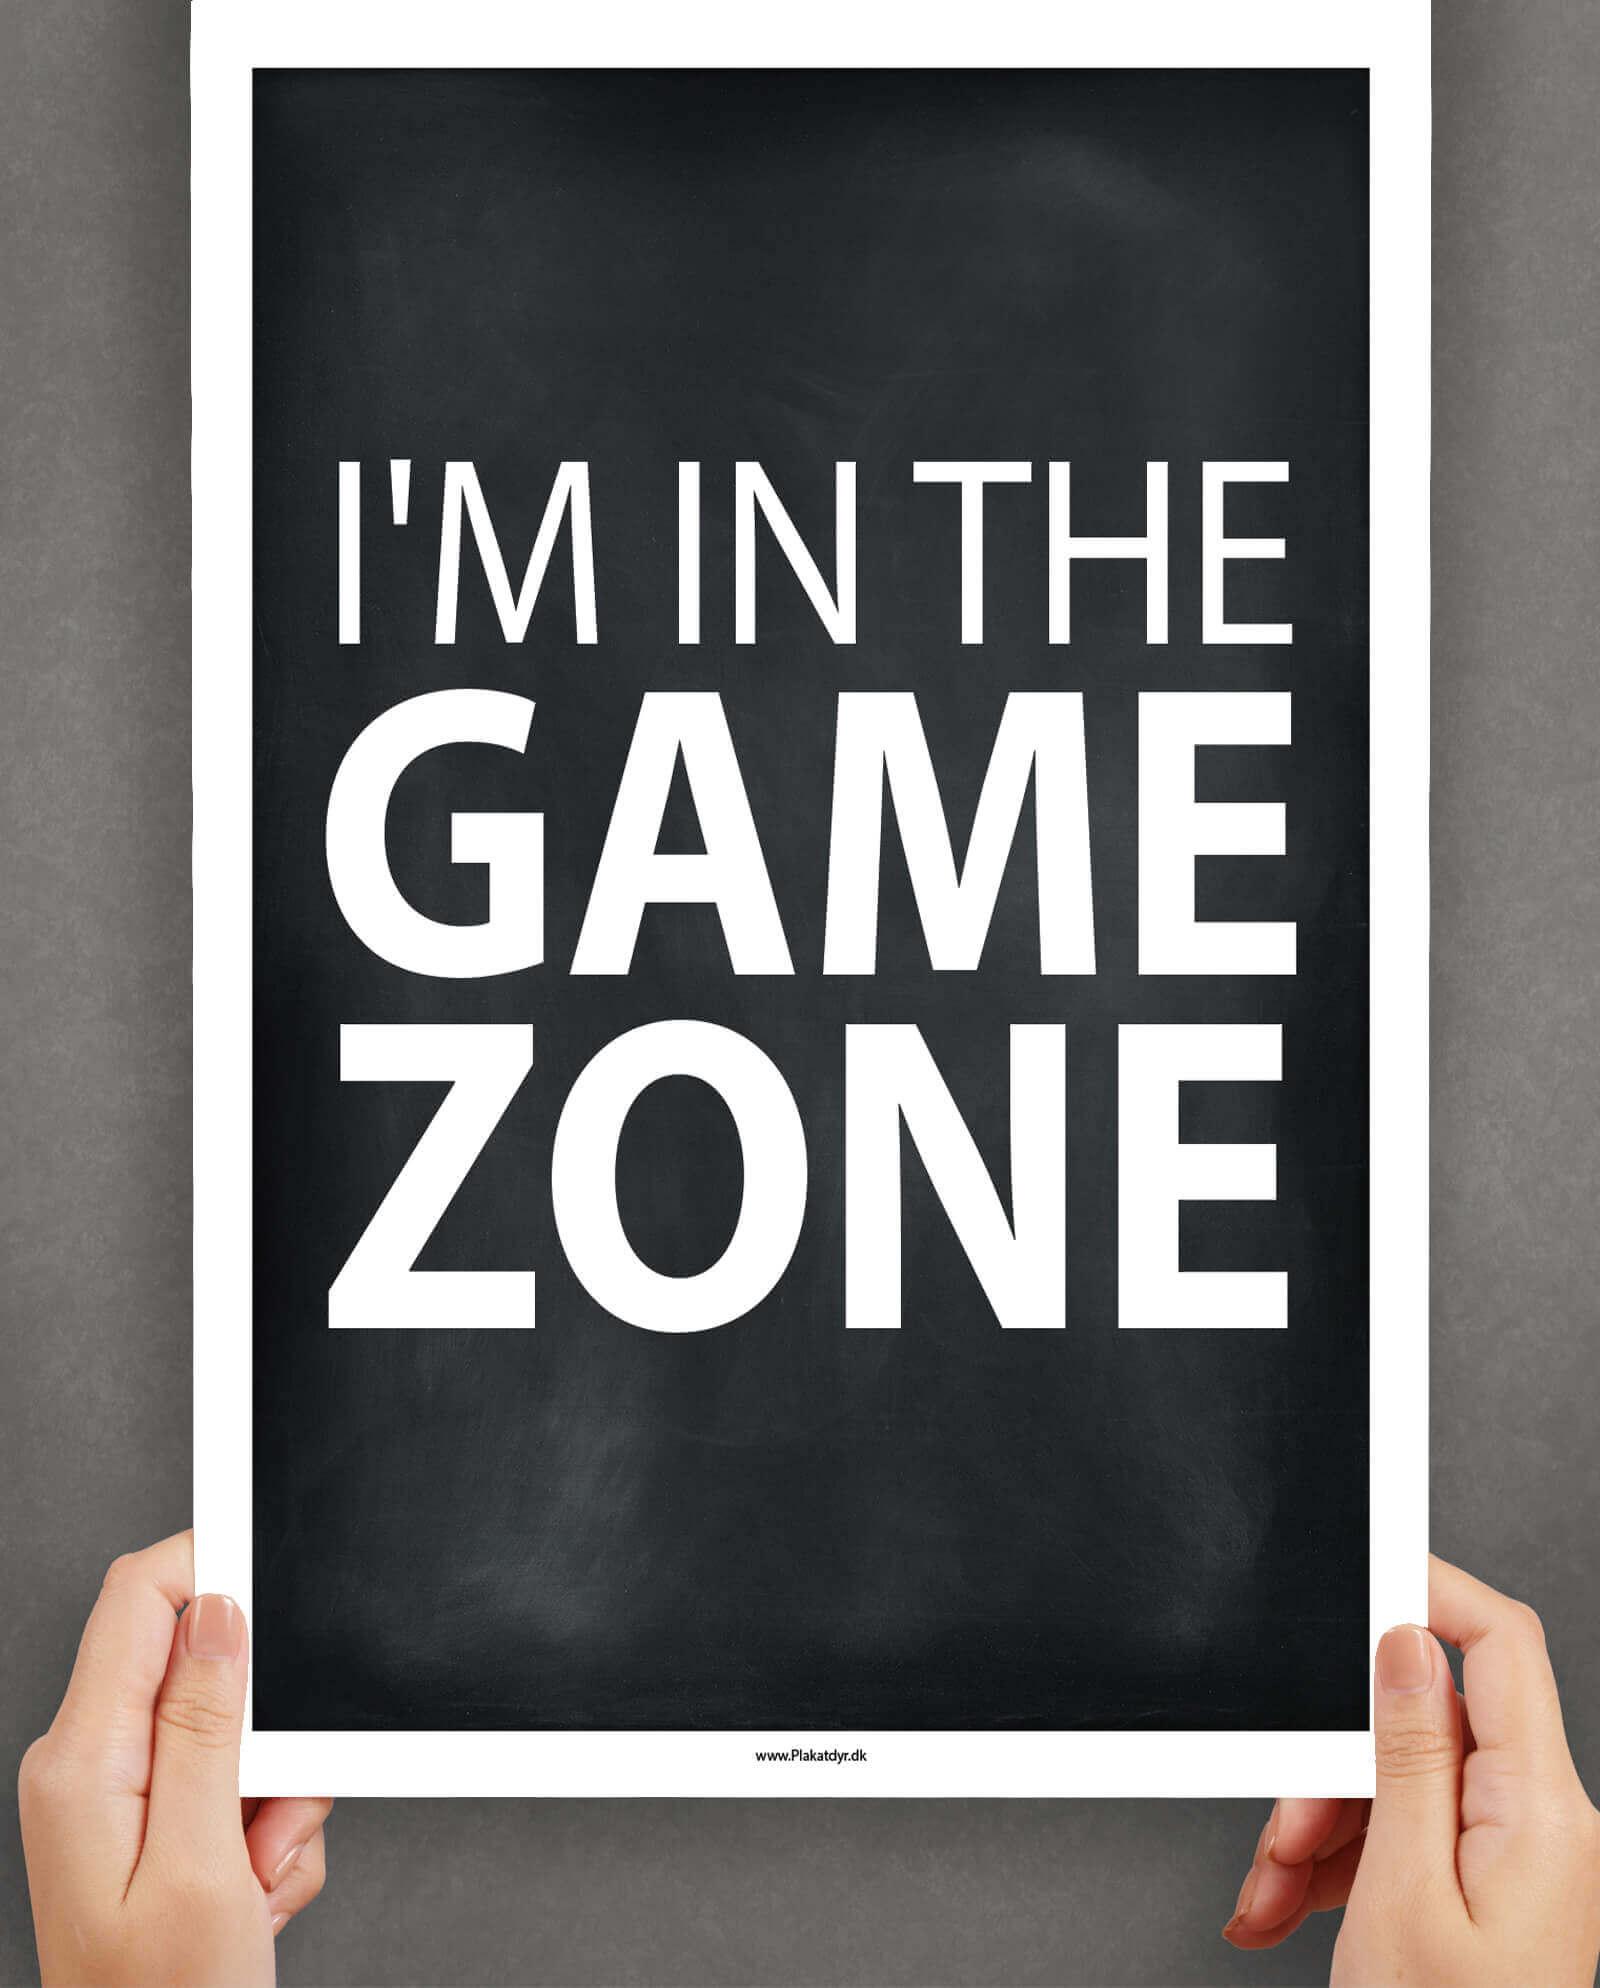 Gamer-I'm-in-the-game-zone-1